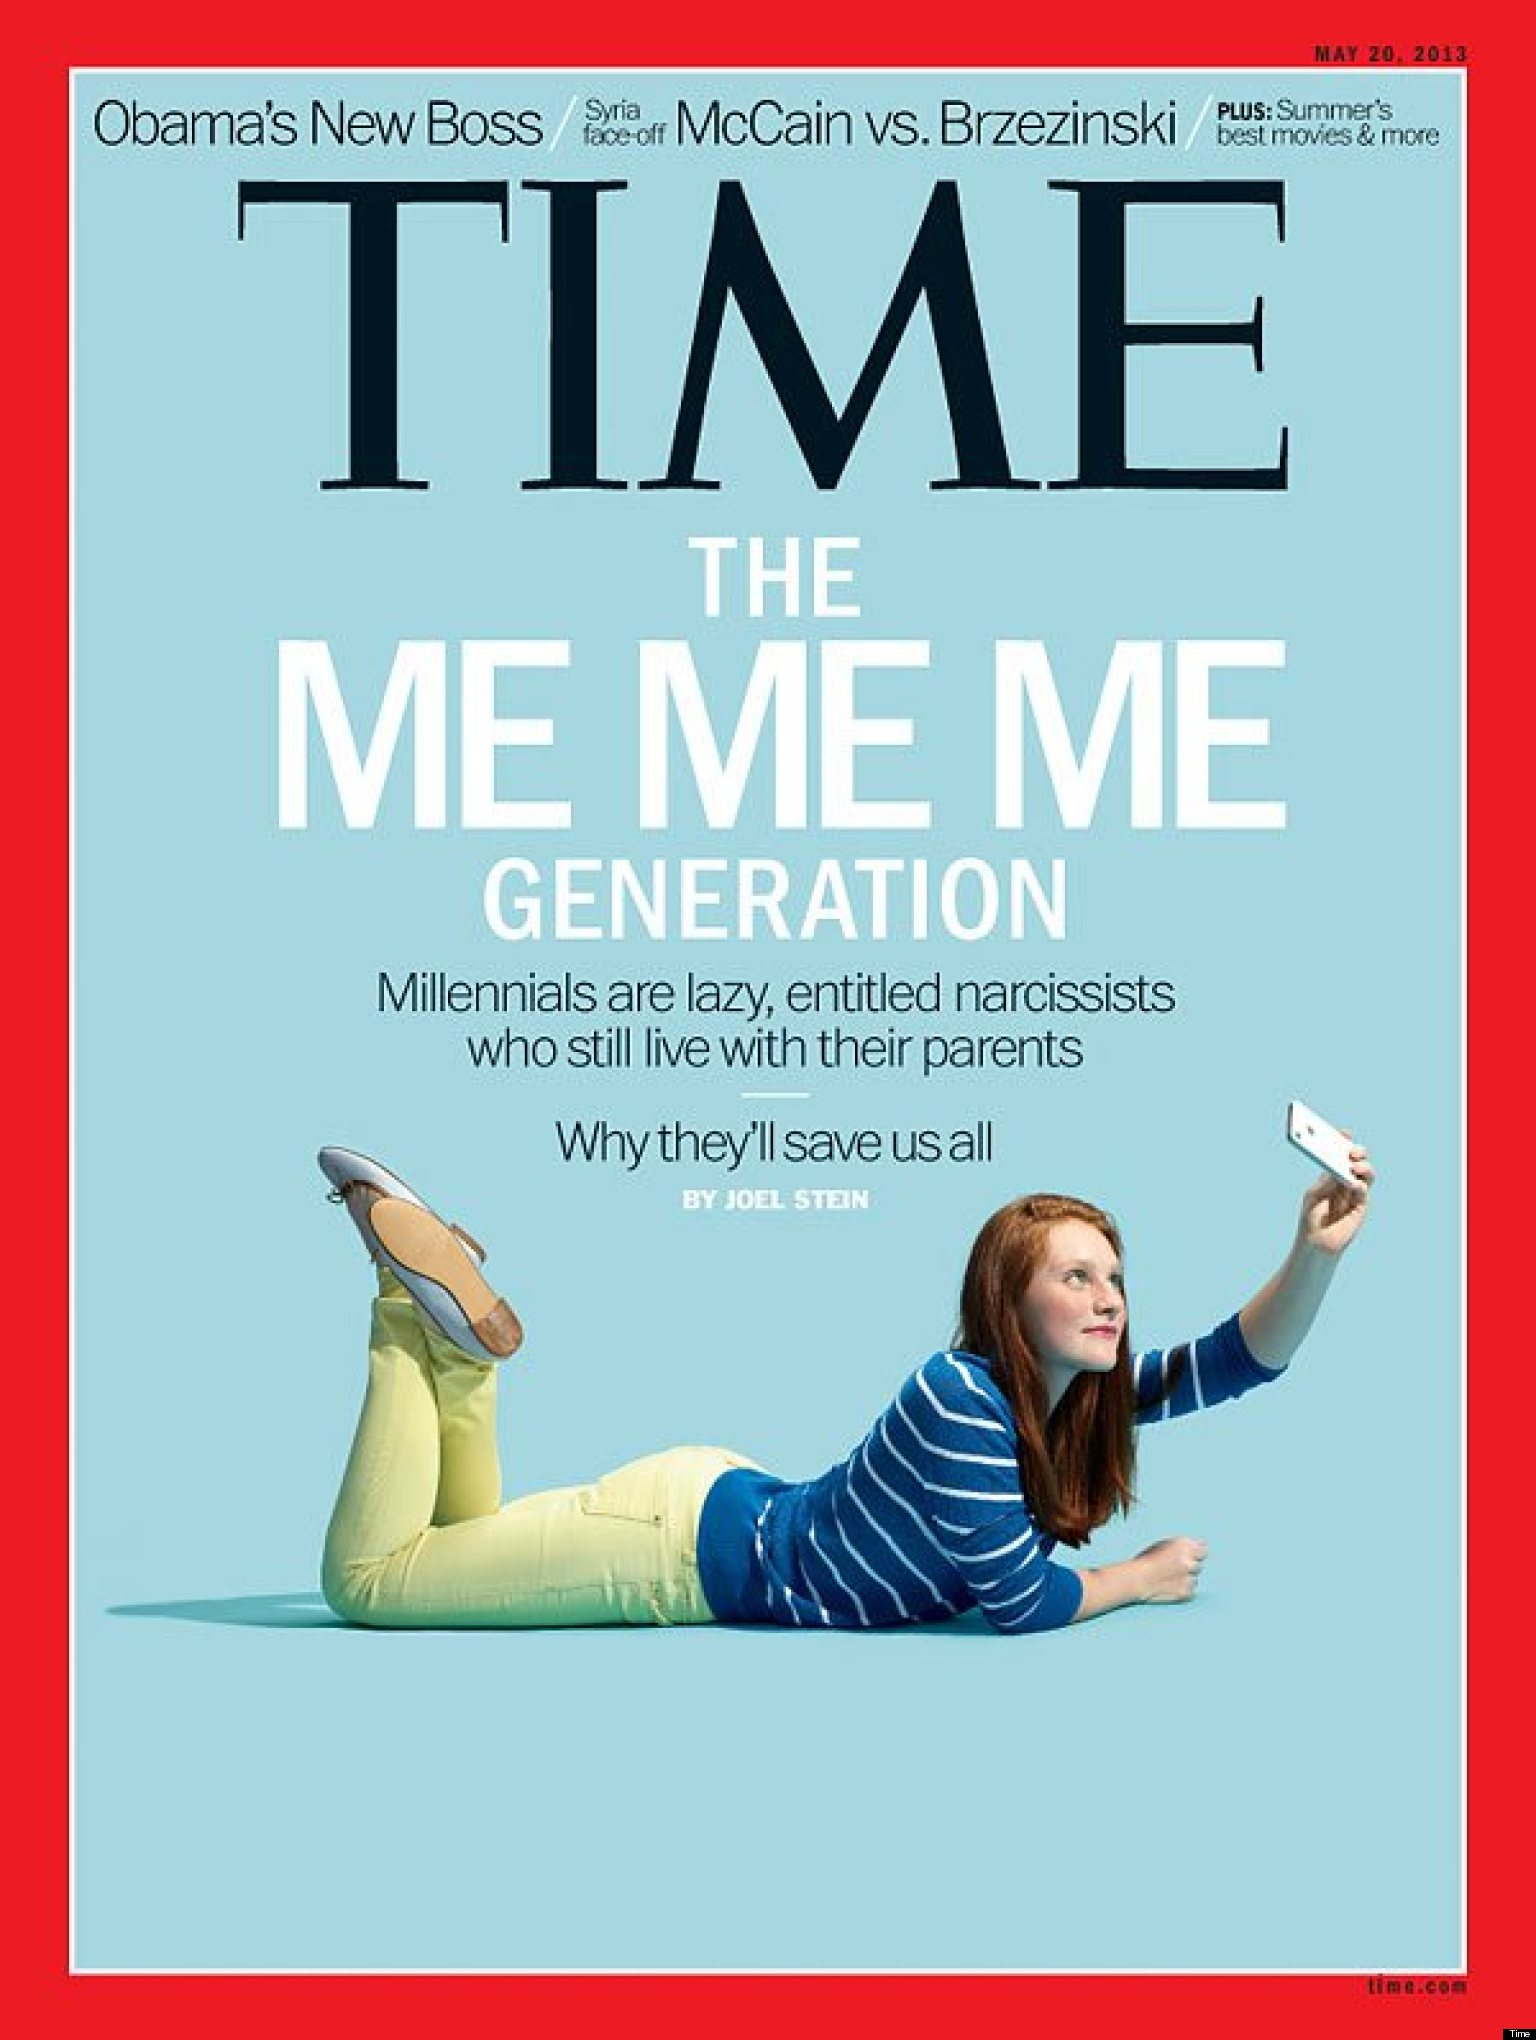 the-me-me-me-generation.jpg